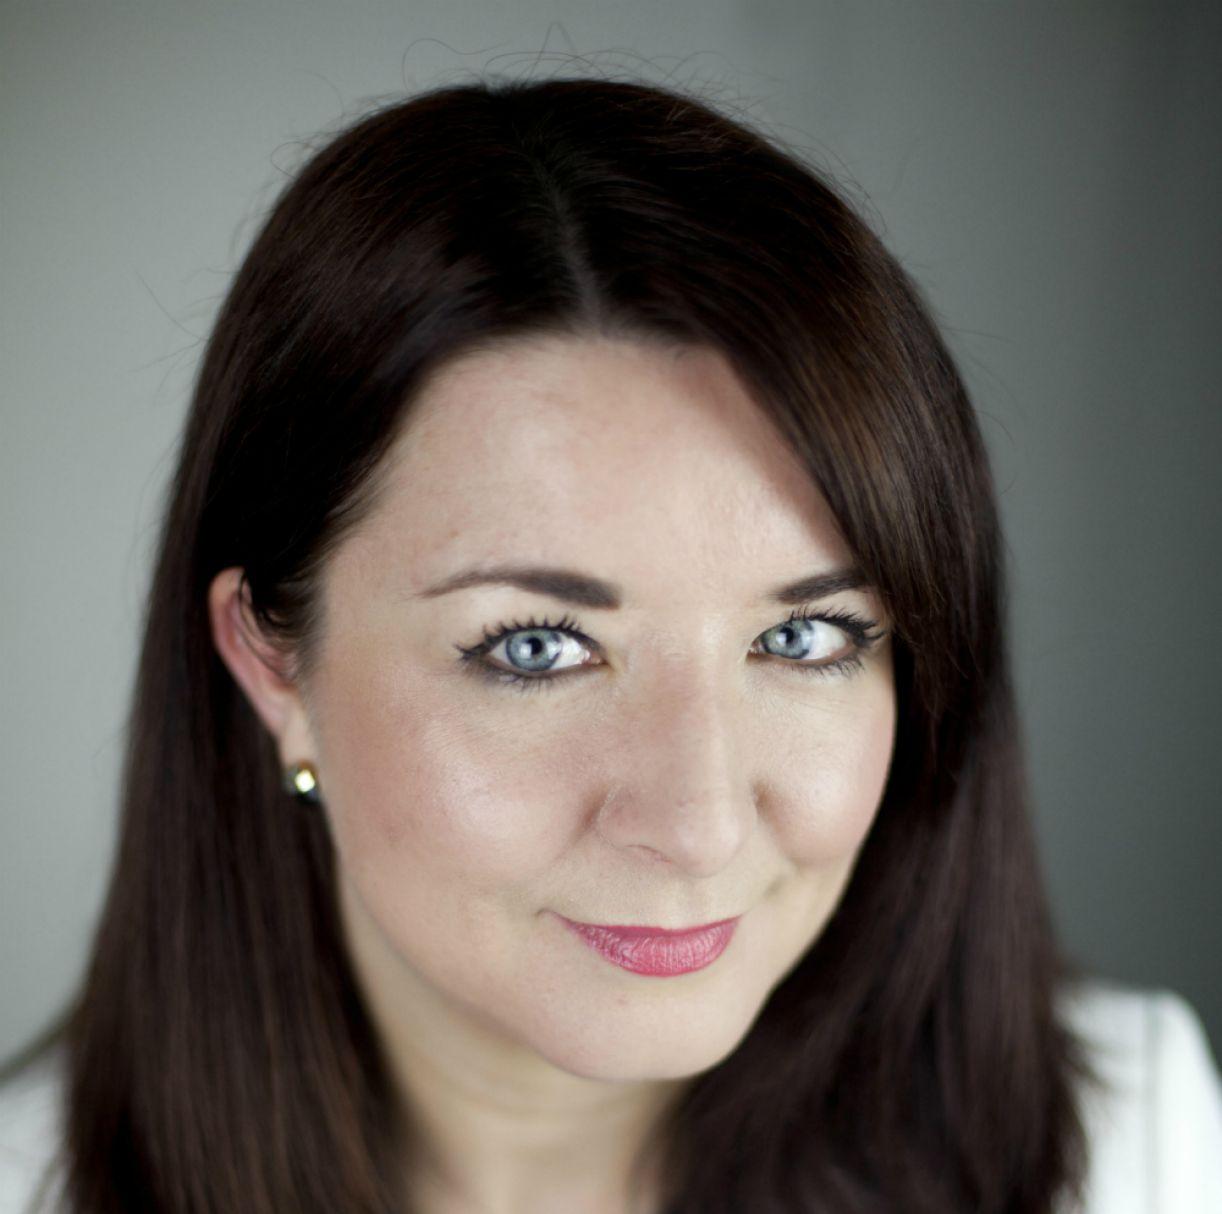 A pesquisadora inglesa Kirsty Fairclough